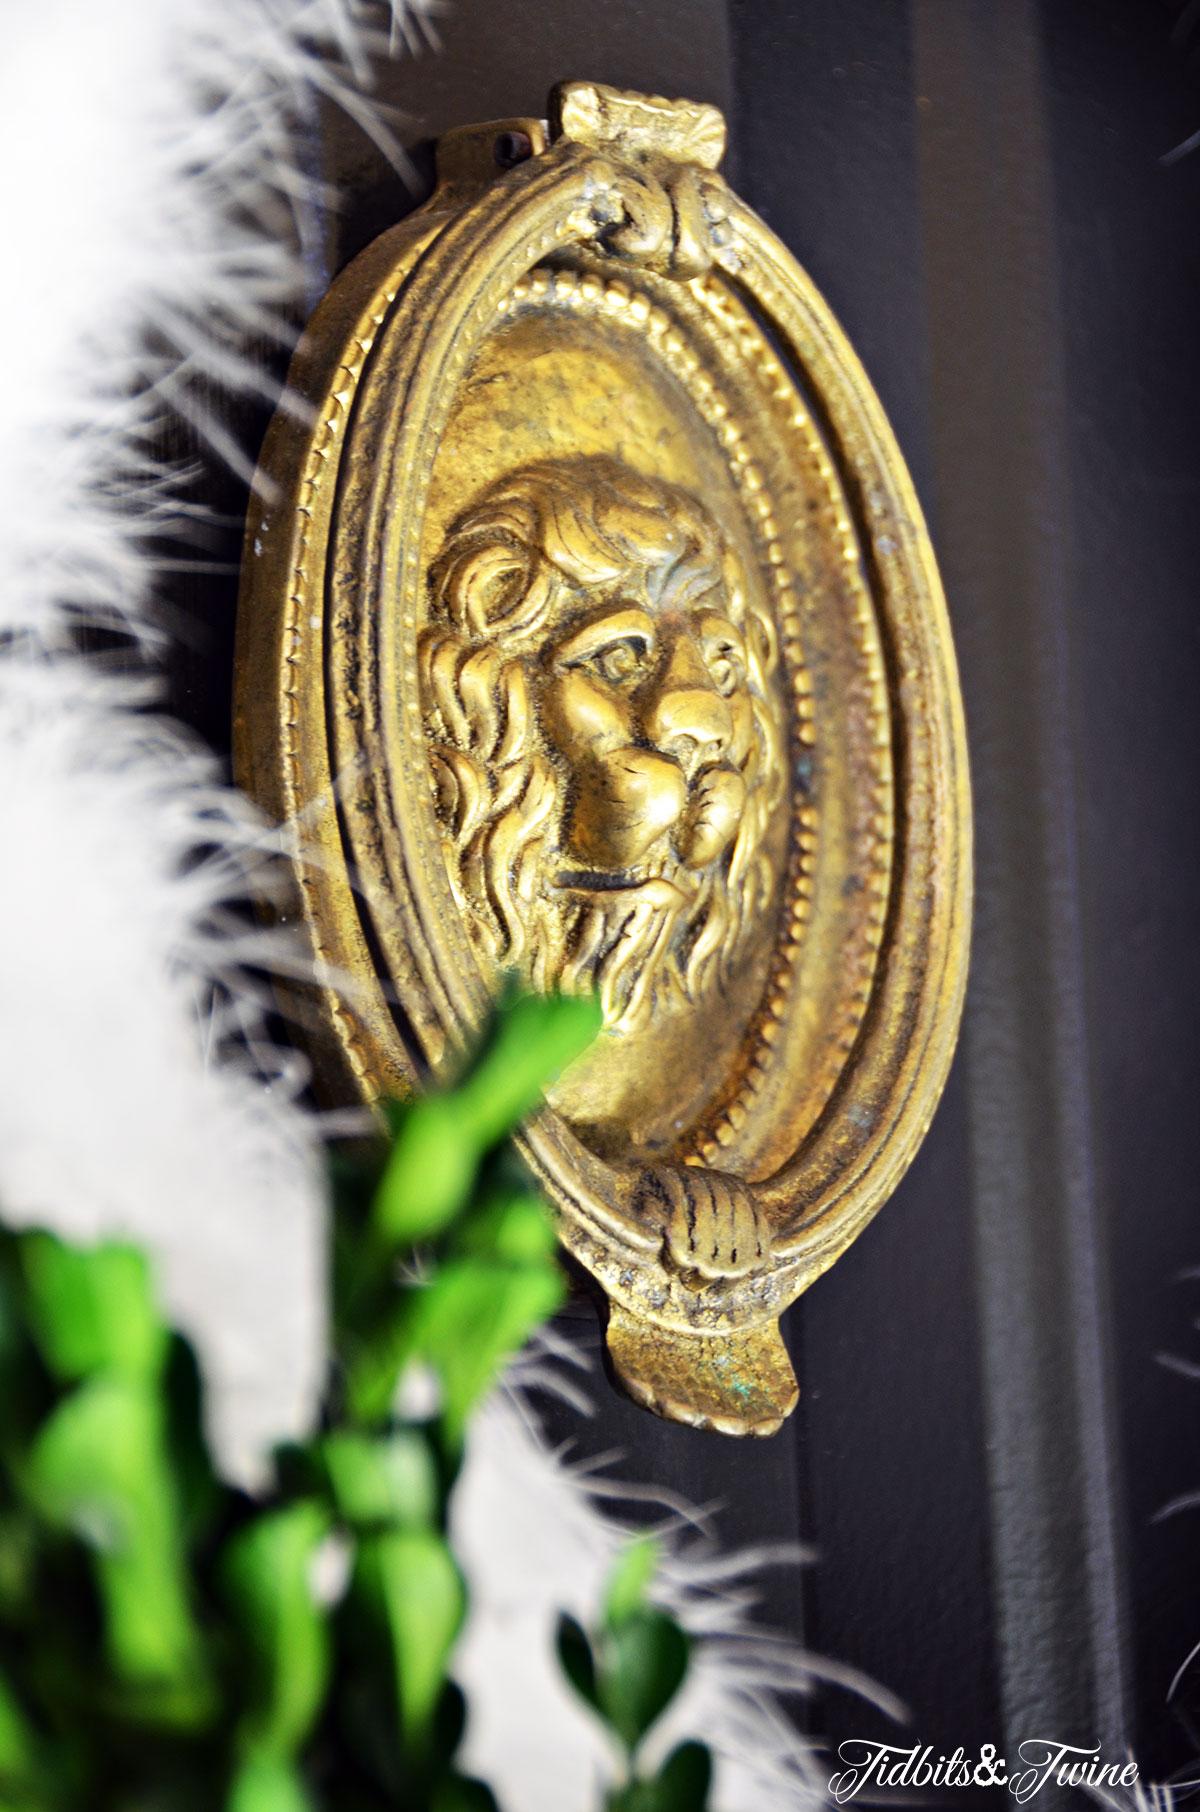 TIDBITS-&-TWINE---DIY-Christmas-Wreath-Vintage-Brass-Lionhead-Knocker